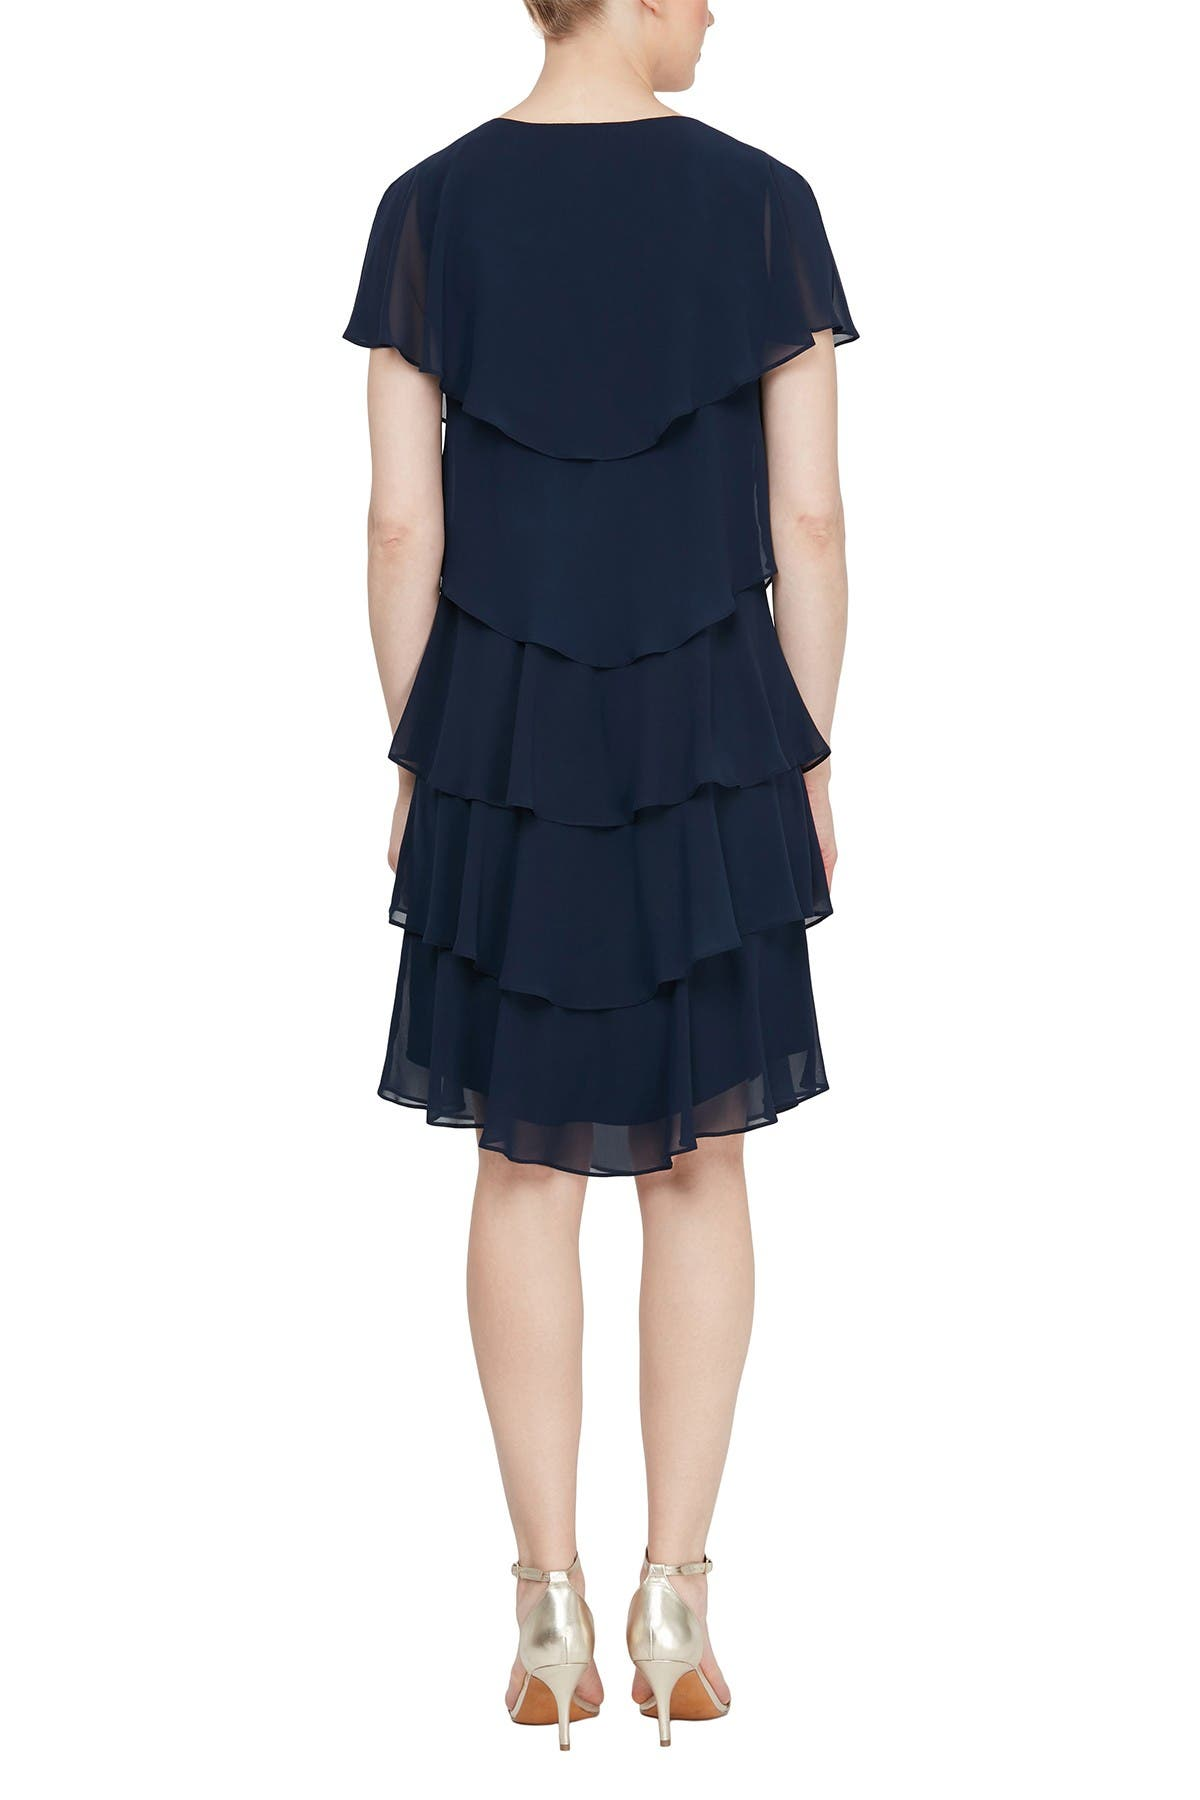 Image of SLNY Tiered Petal Chiffon Dress